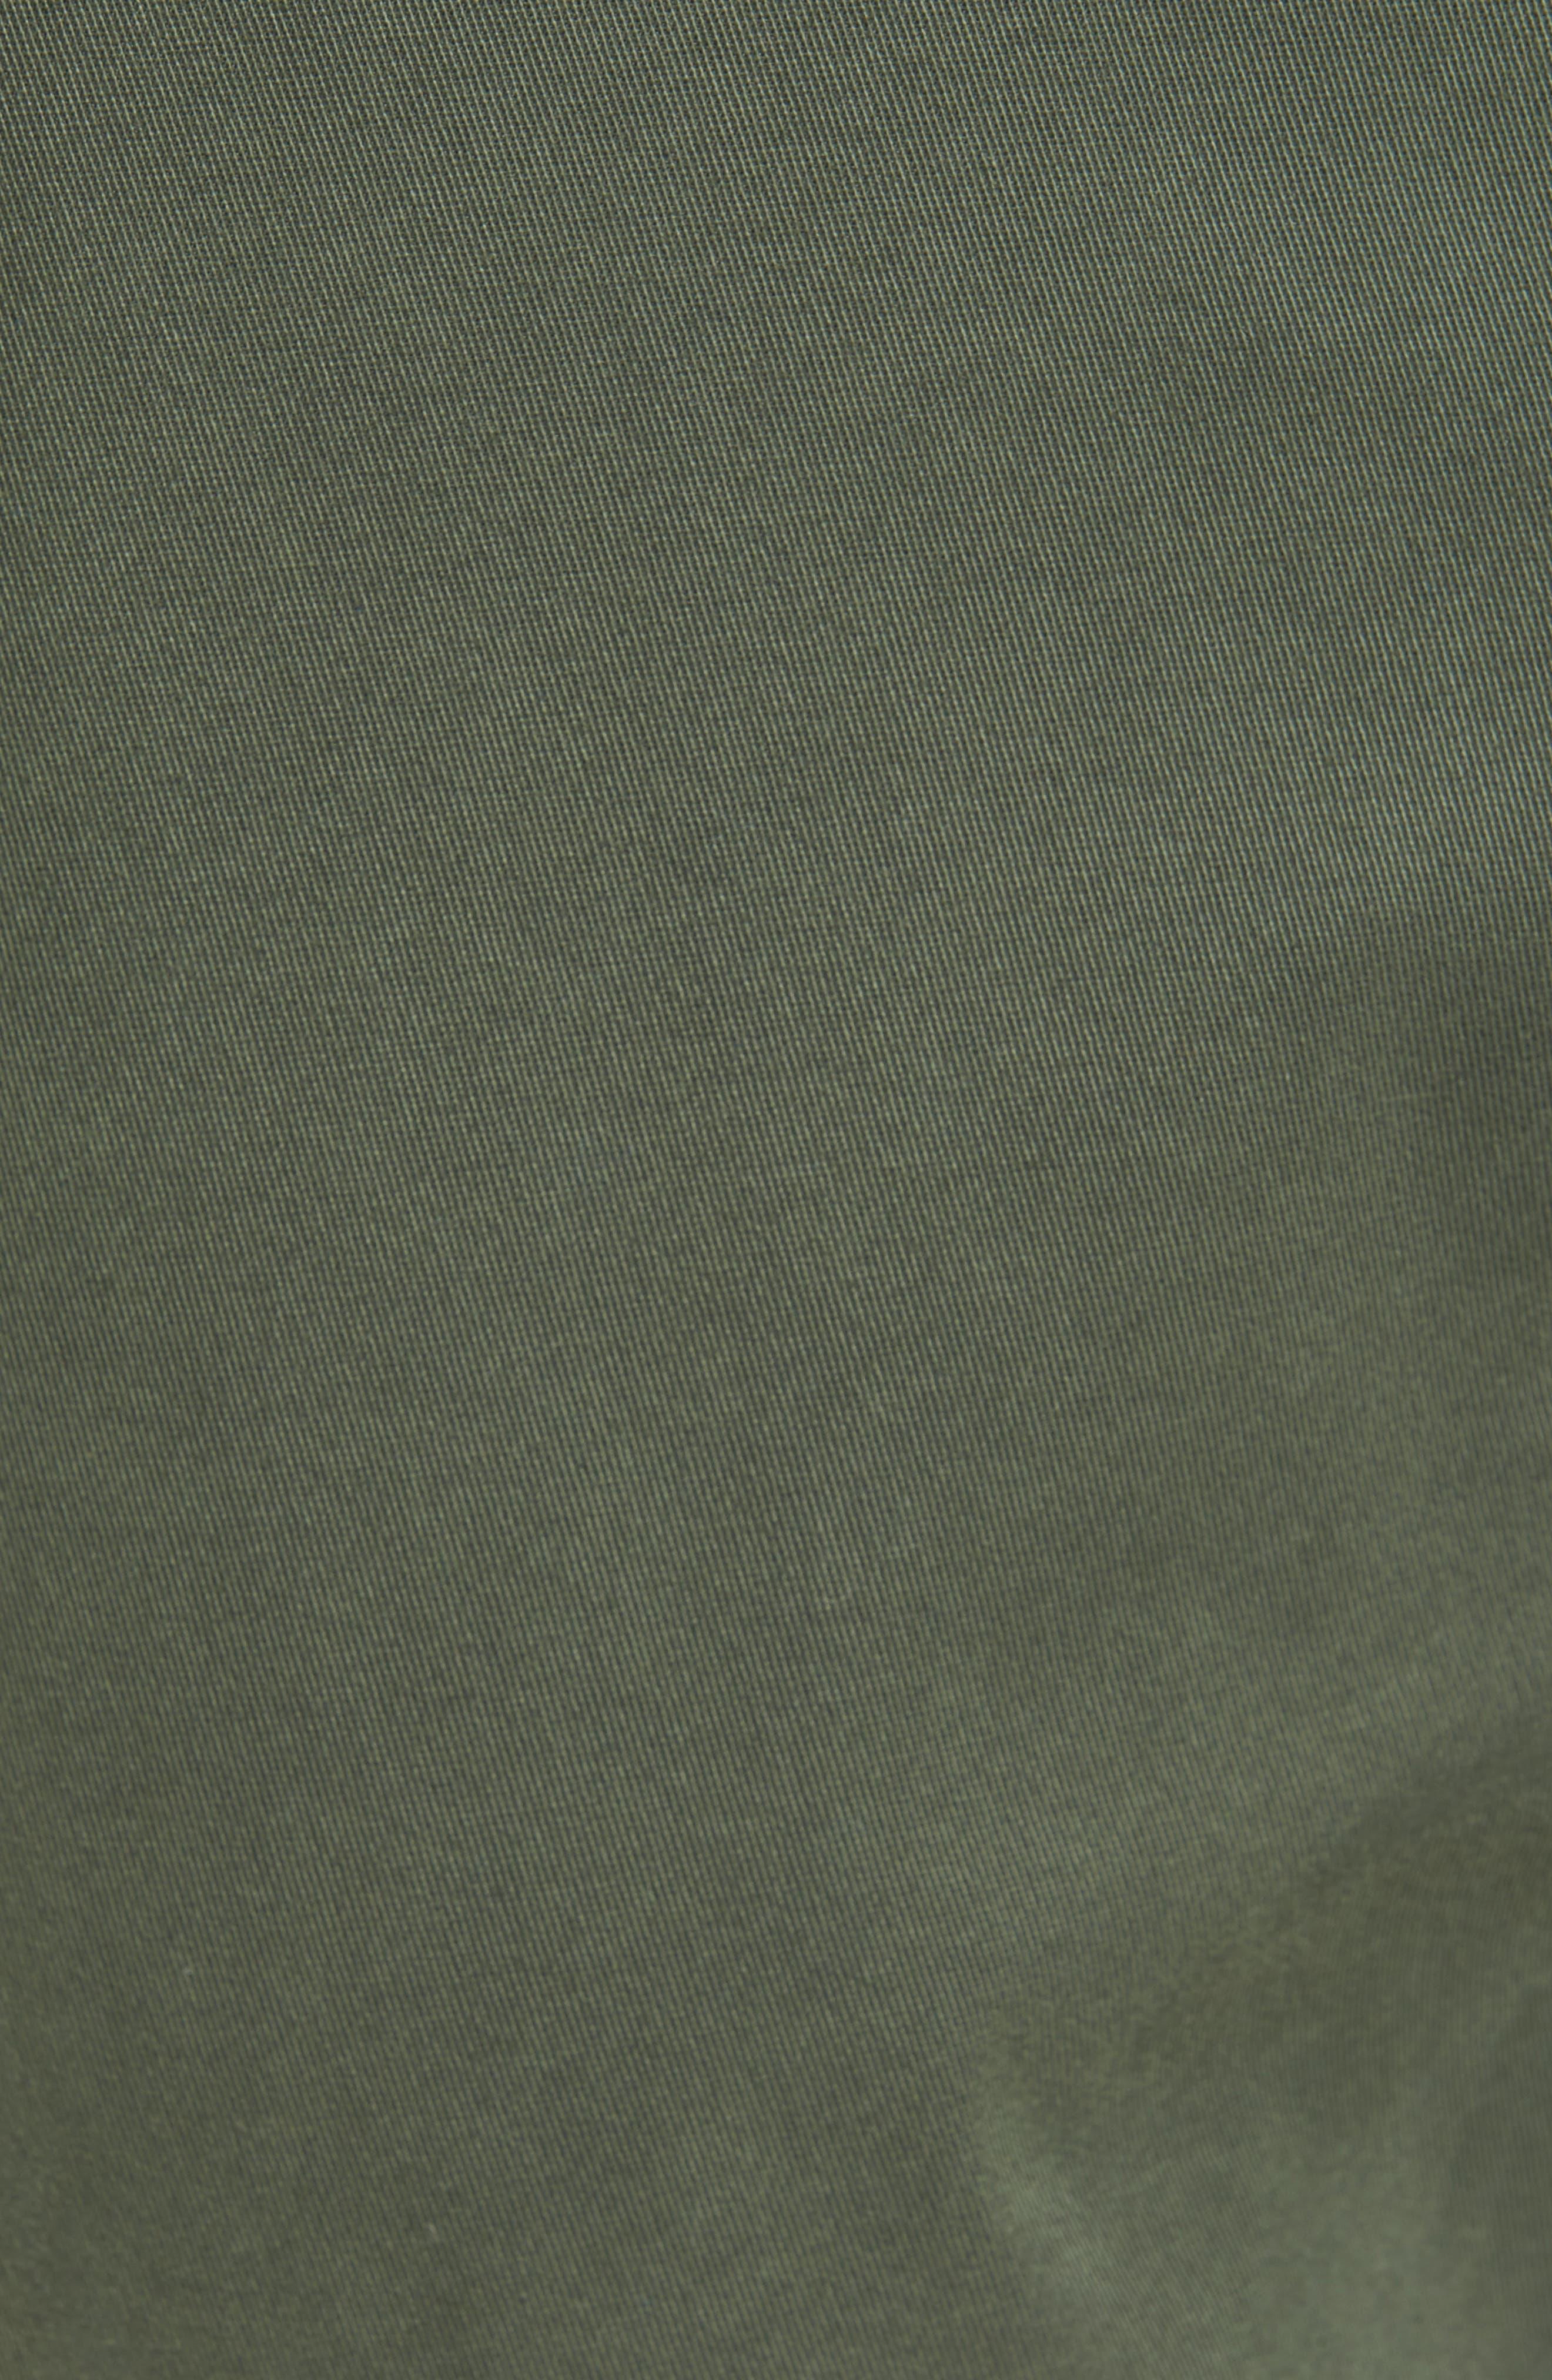 Alternate Image 5  - Michael Bastian Stretch Twill Cargo Pants